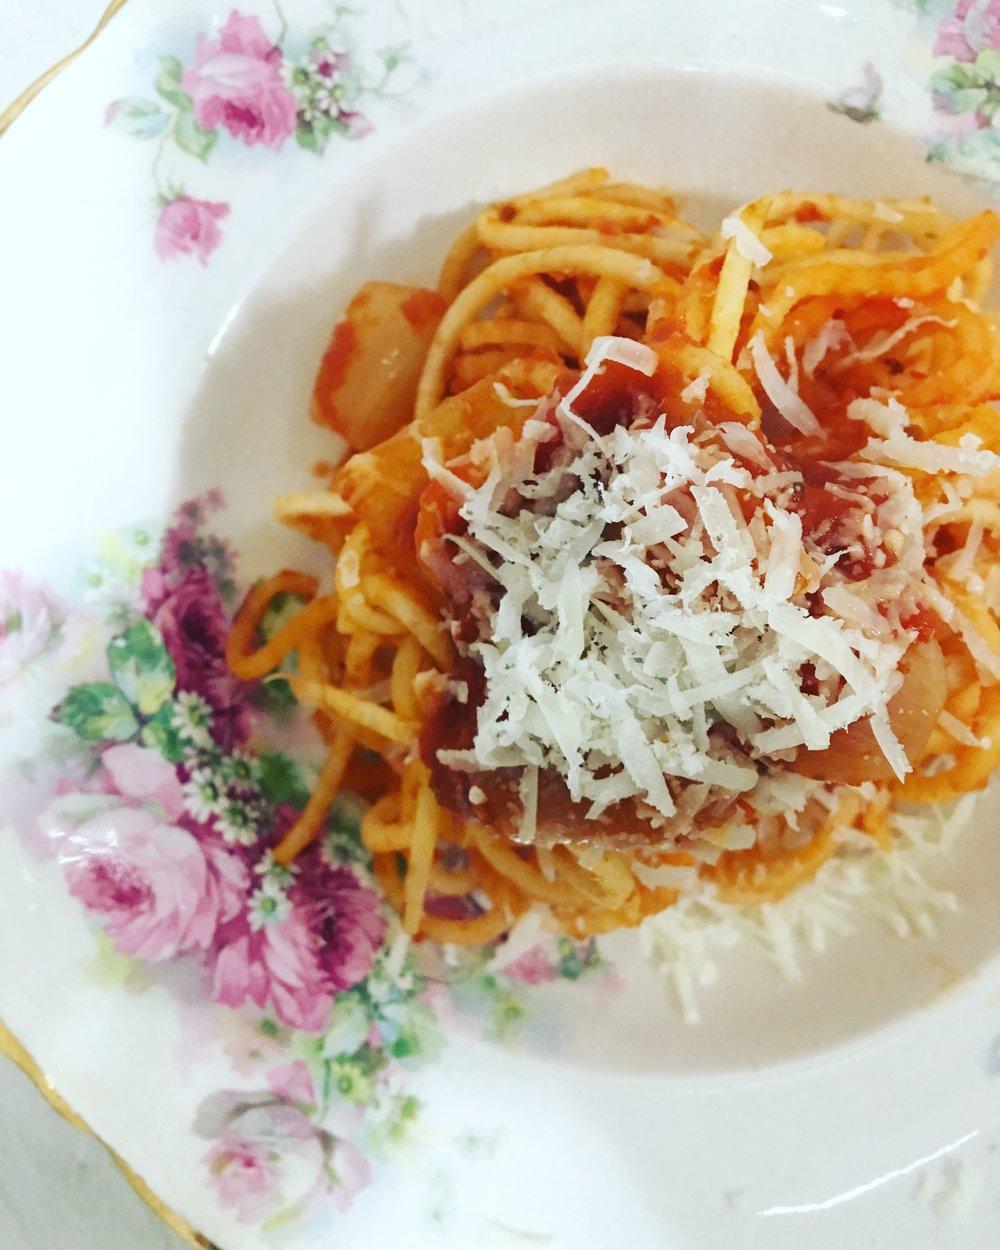 Late Night Dinner Diaries: Turnip Noodles / Red Sauce / Pecorino